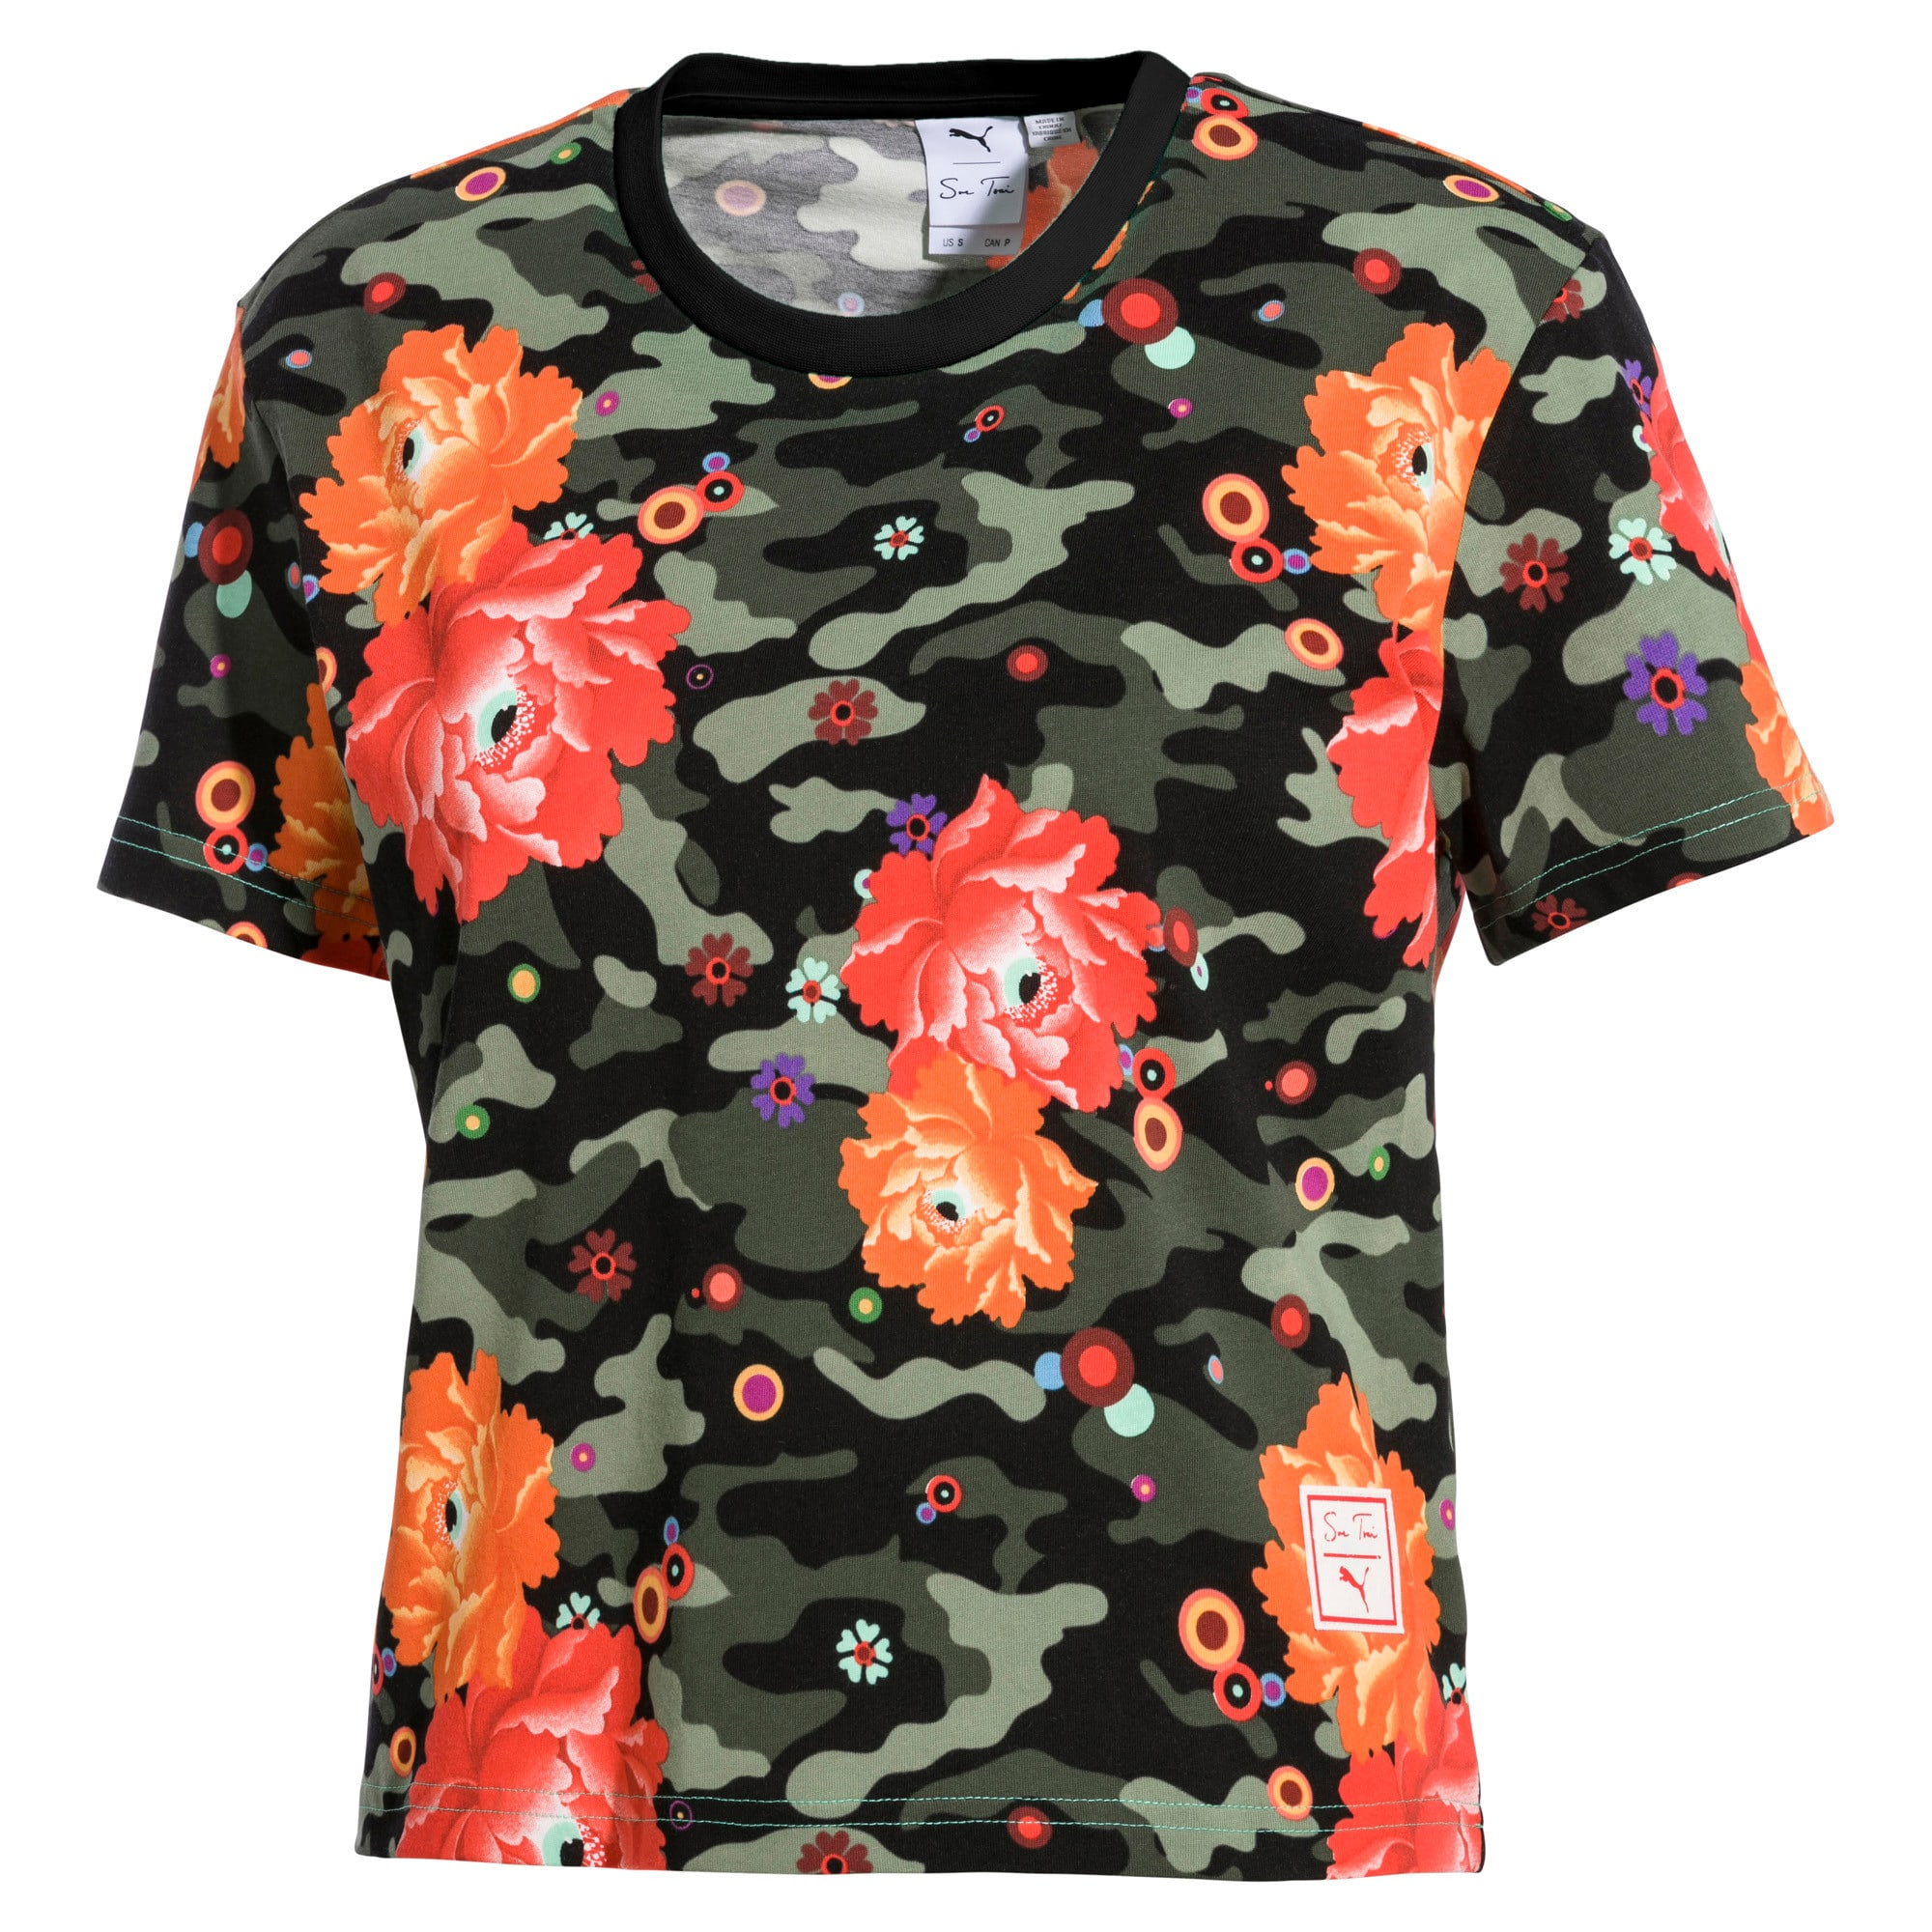 Thumbnail 1 of PUMA x SUE TSAI ウィメンズ  Tシャツ, Puma Black- Peony, medium-JPN